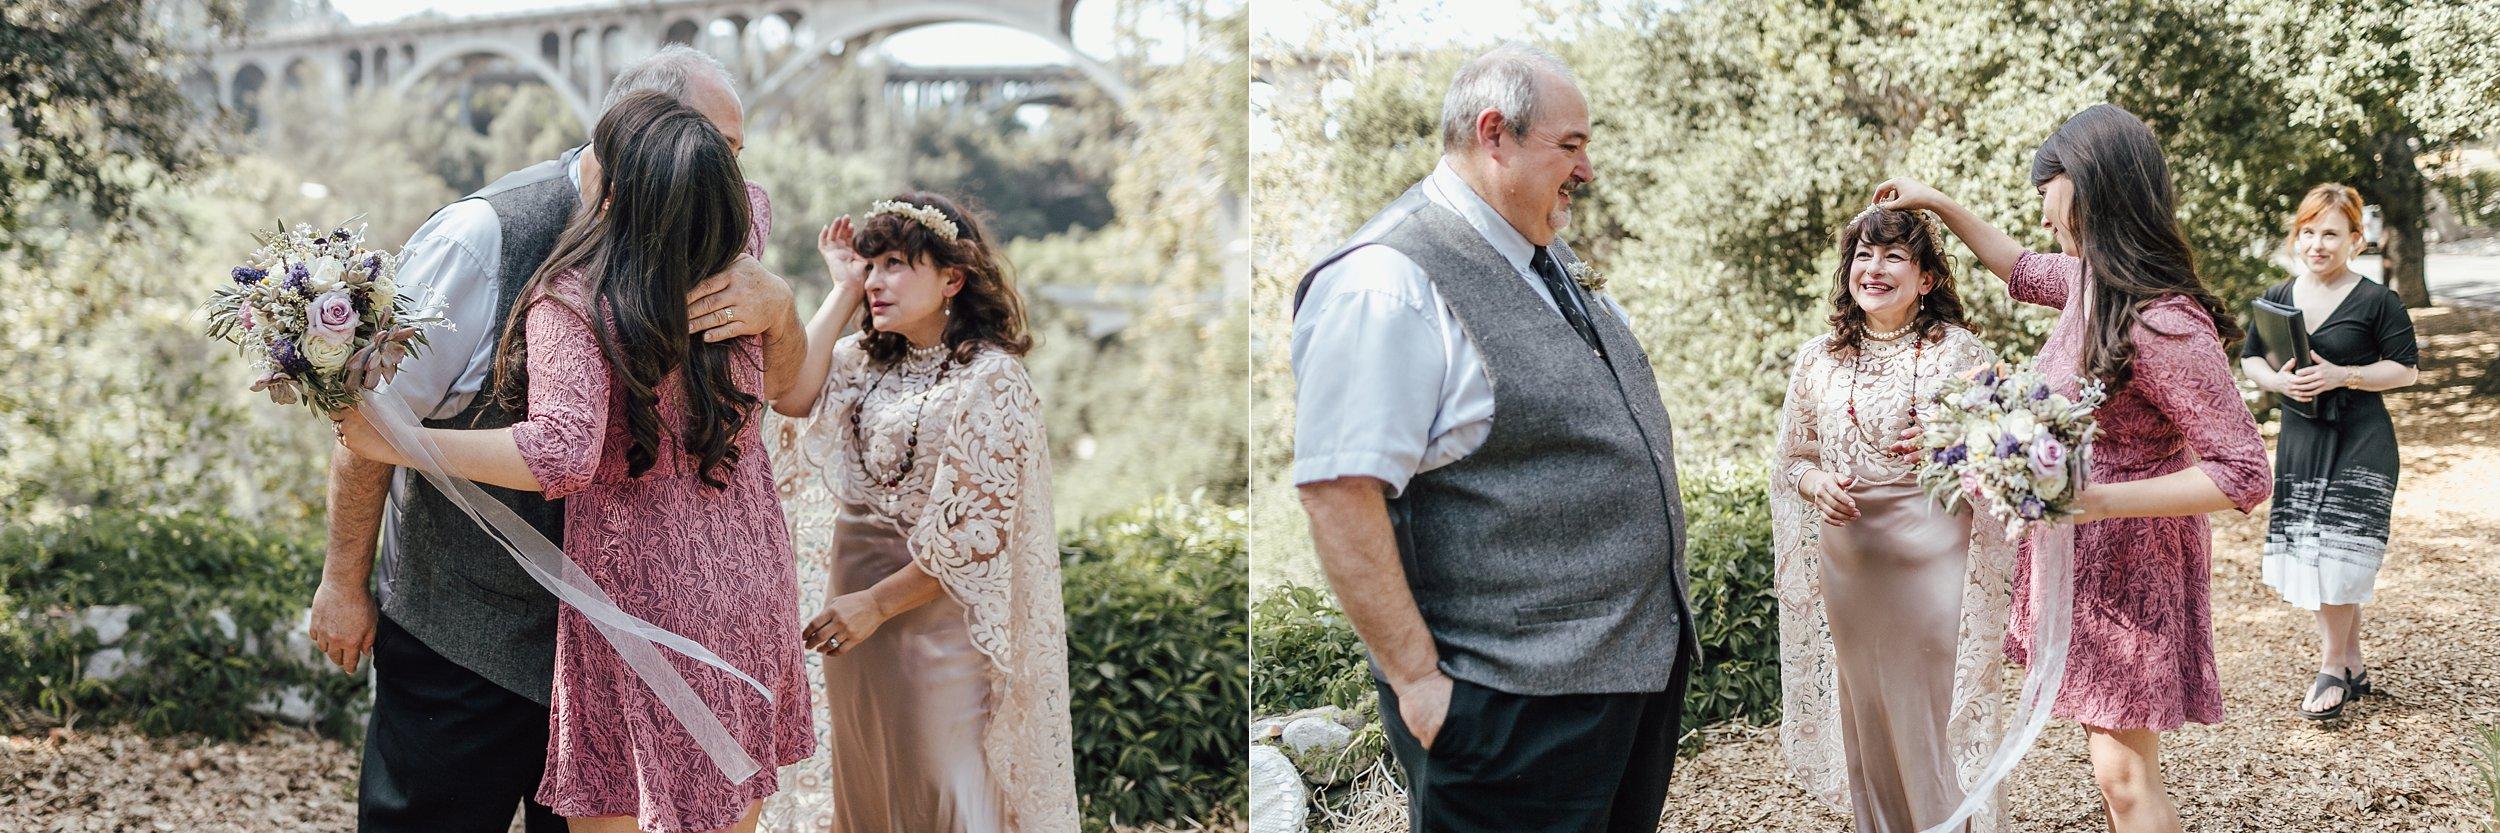 Pasadena California wedding elopement_0013.jpg